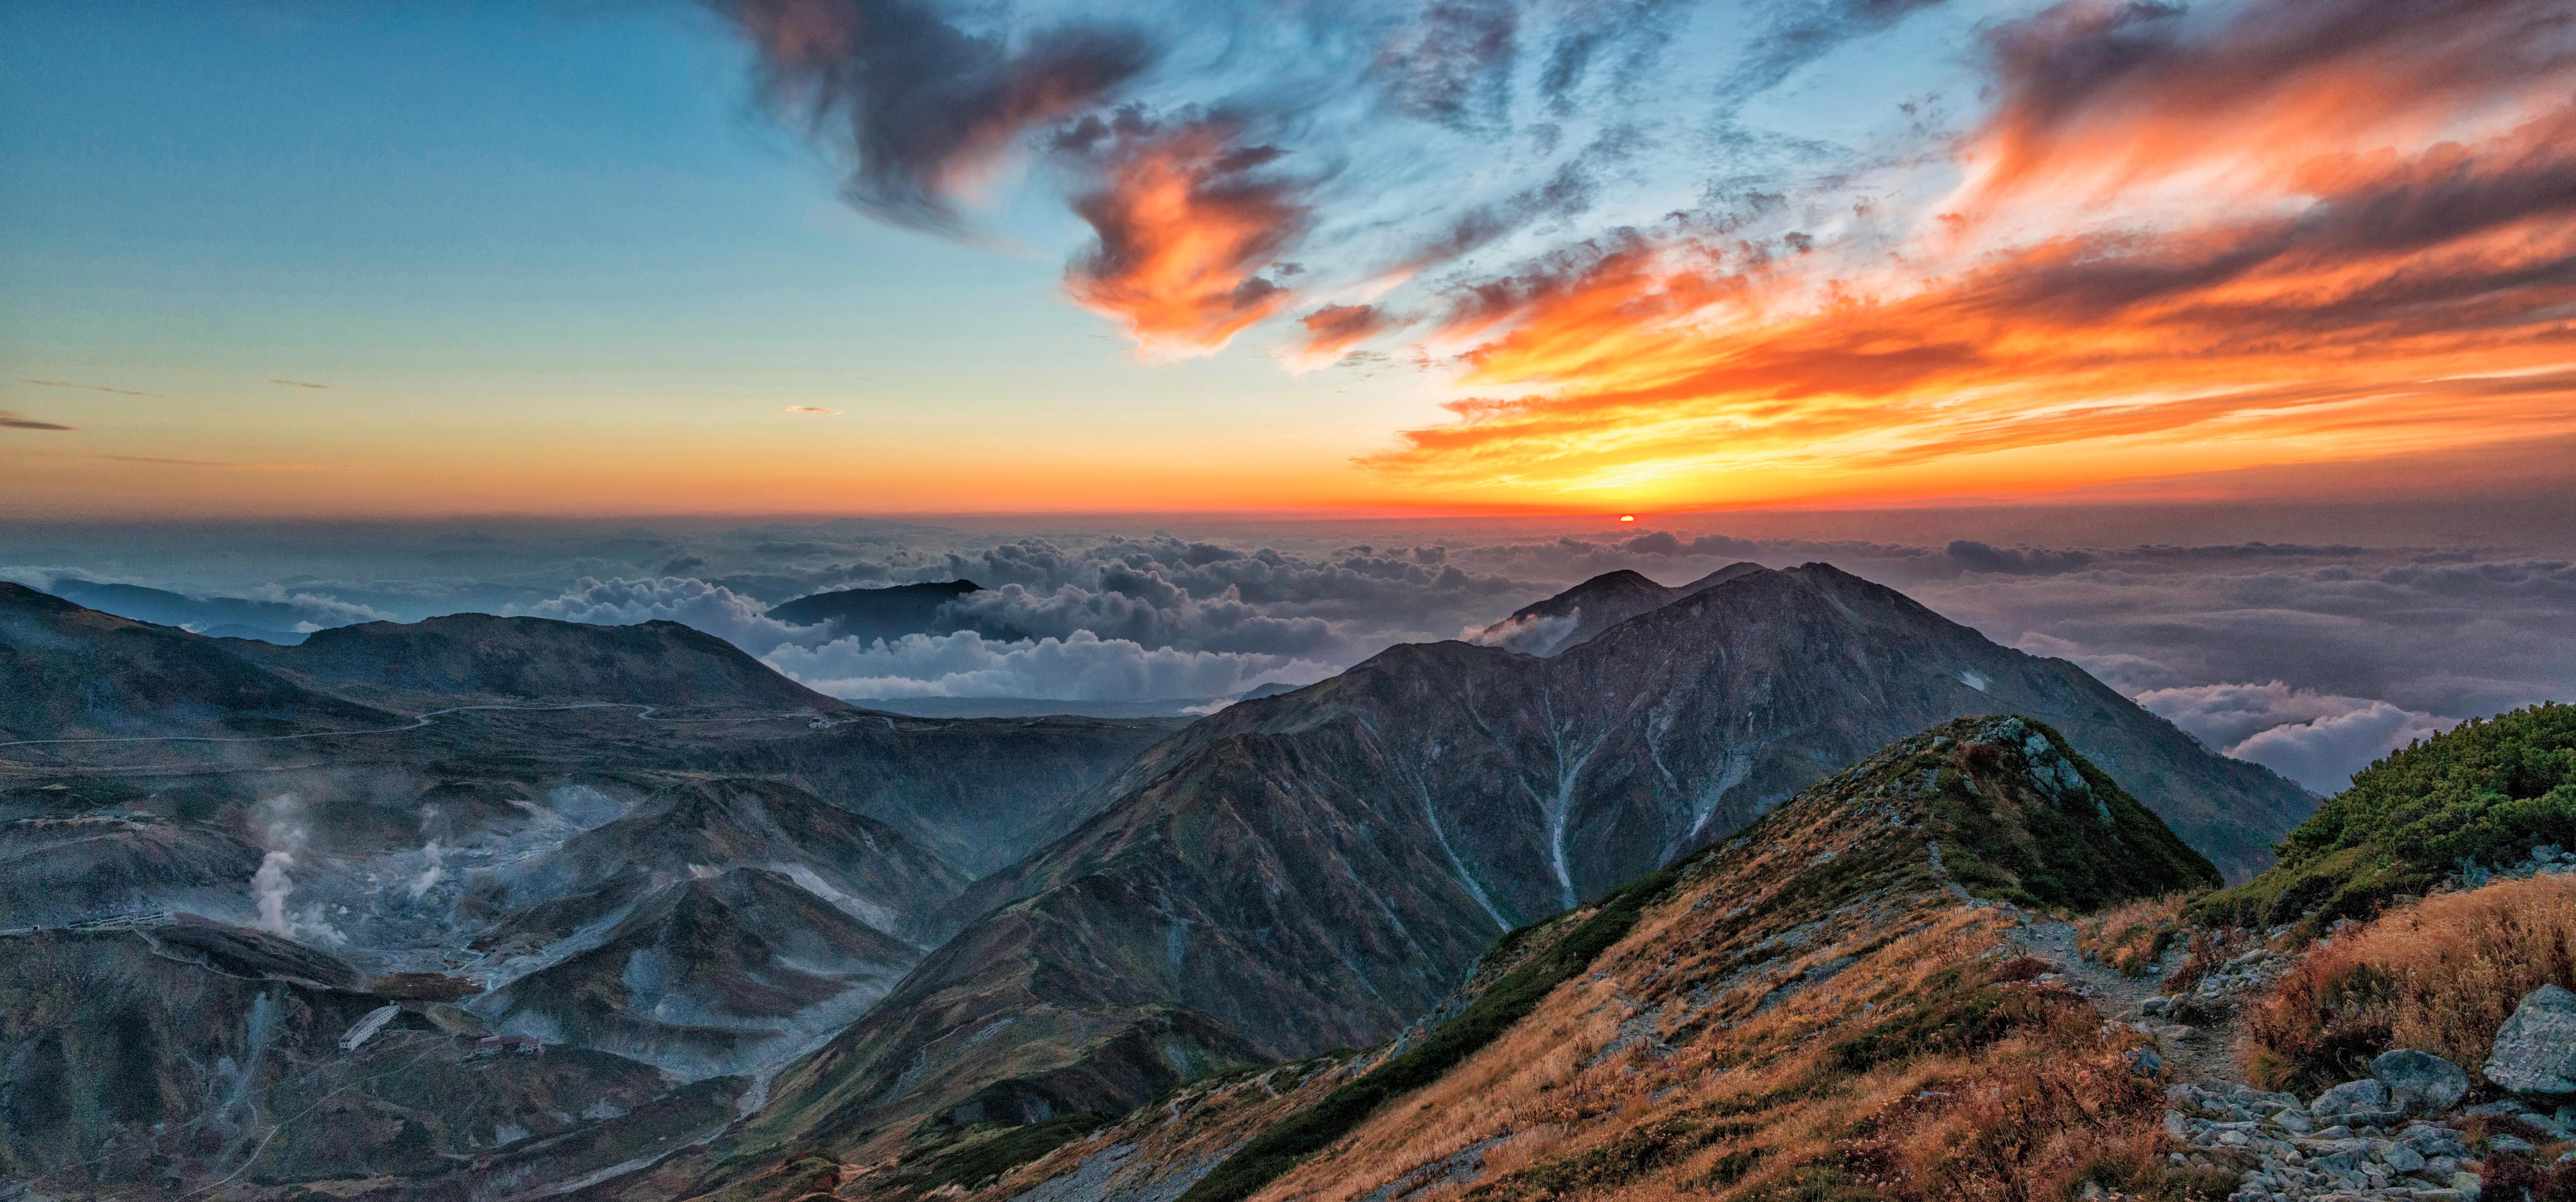 Bird's-eye View Photography of Mountains · Free Stock Photo   8192 x 3822 jpeg 6072kB